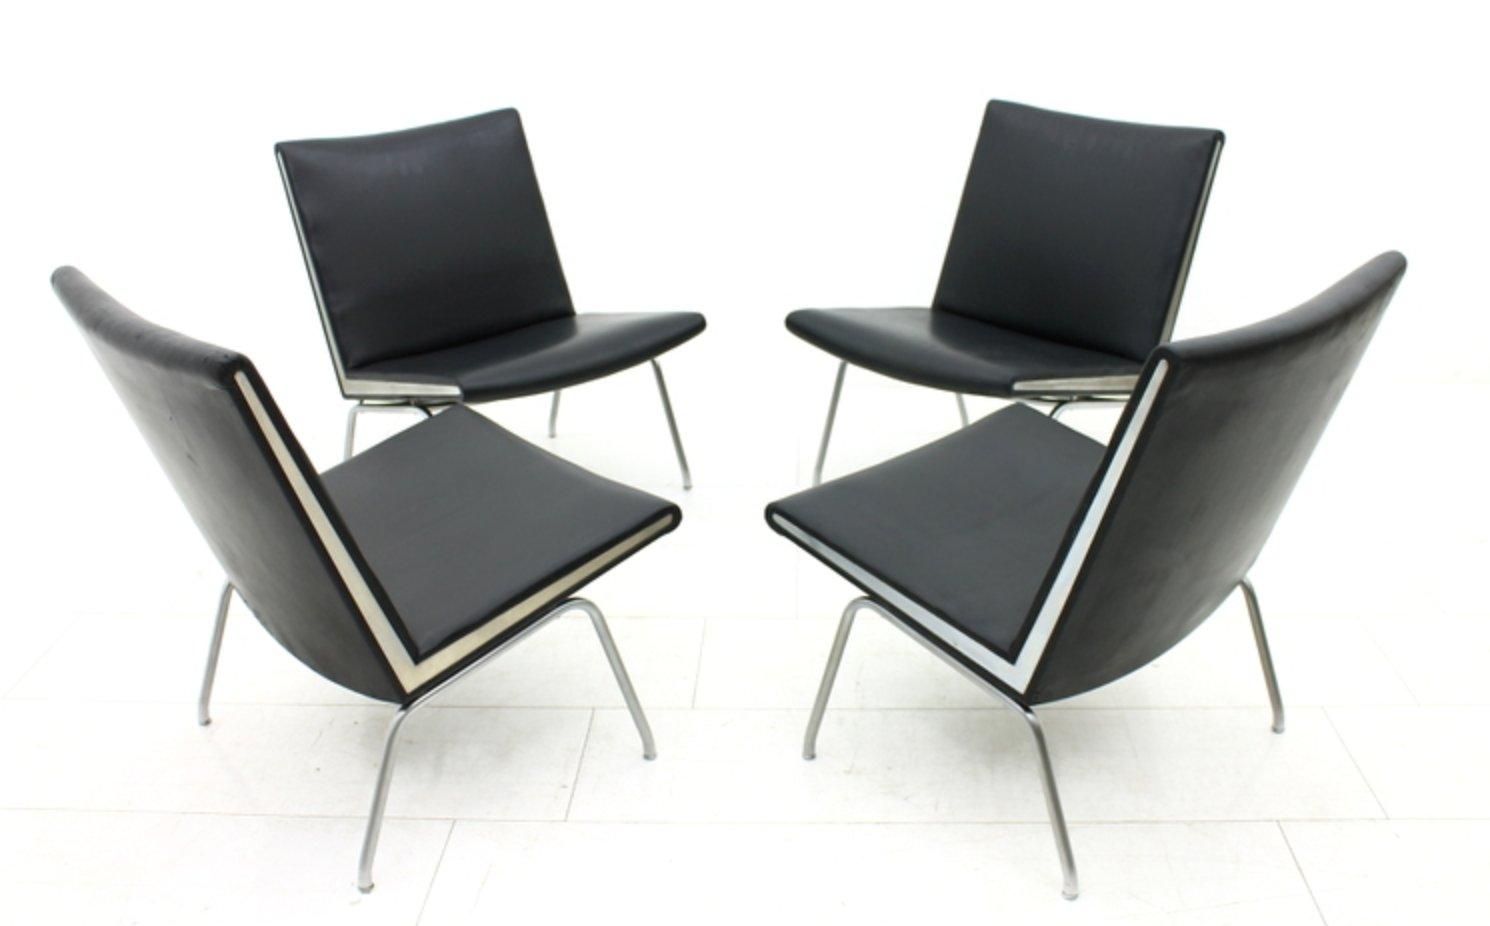 ap 40 flughafen stuhl von hans j wegner f r ap stolen. Black Bedroom Furniture Sets. Home Design Ideas